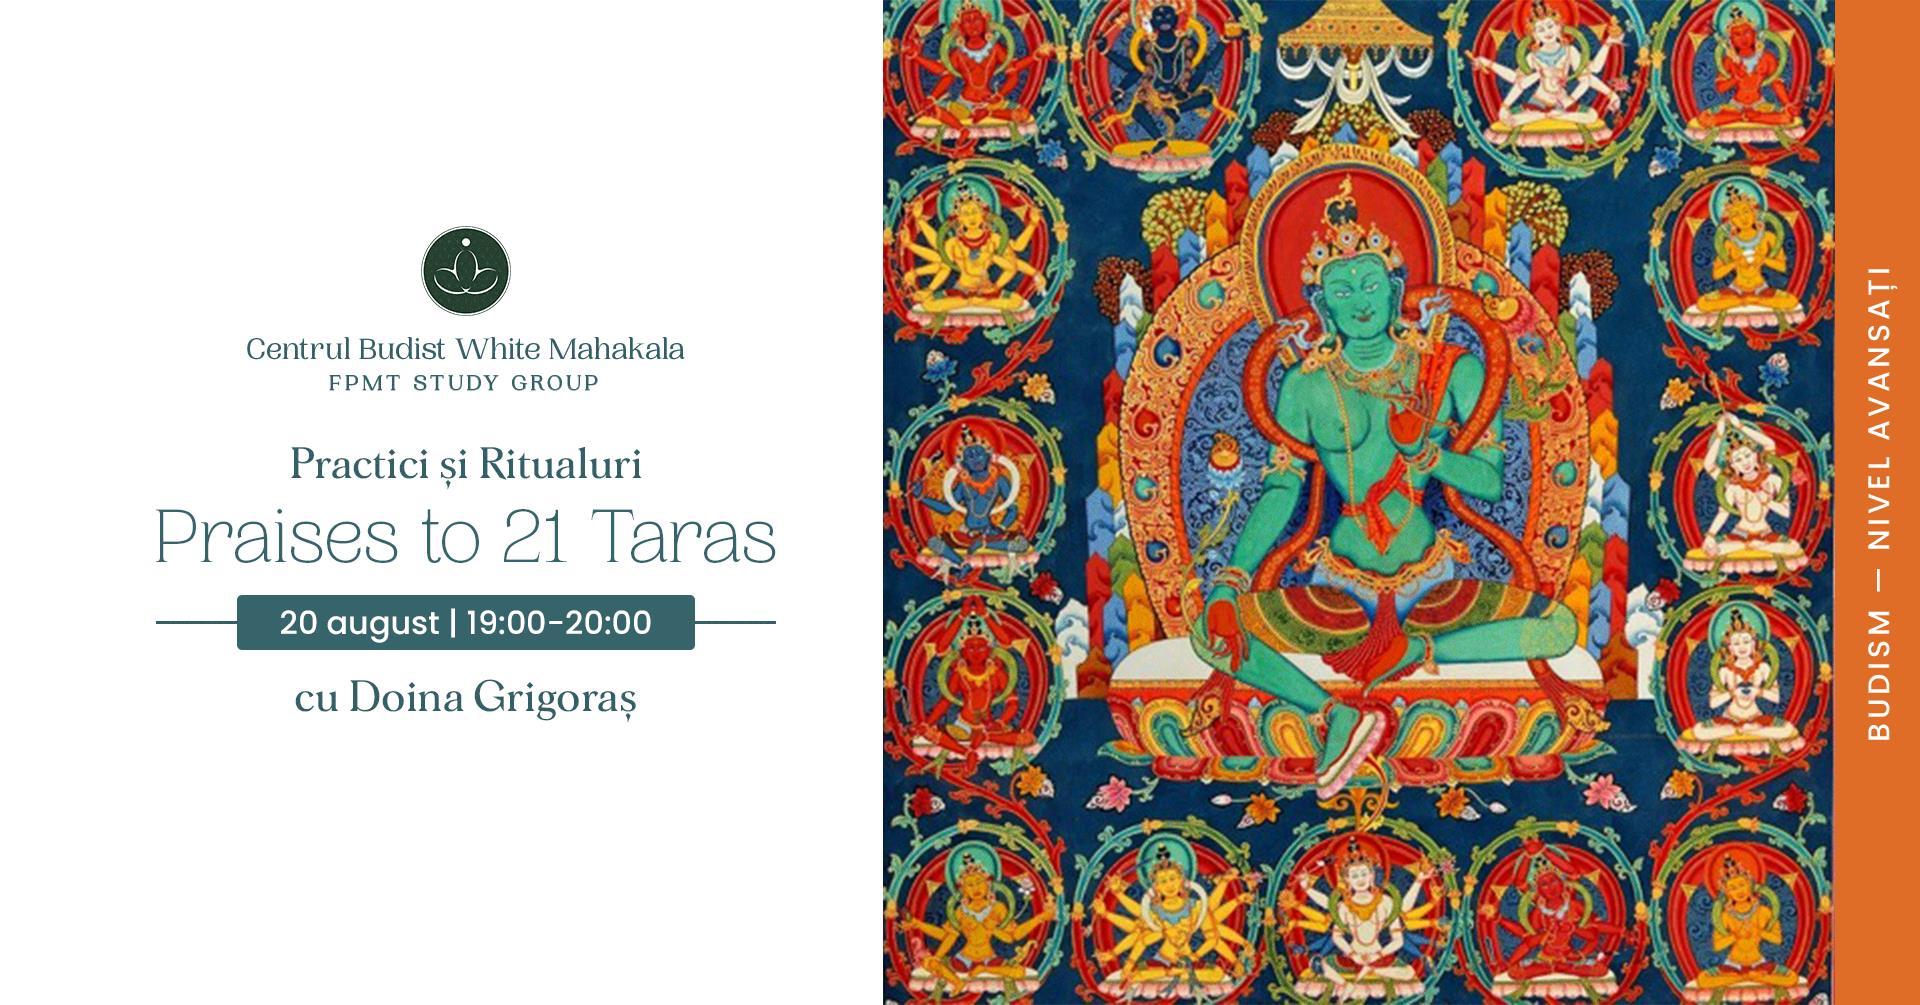 PRACTICI SI RITUALURI BUDISTE – Praises to 21 Taras